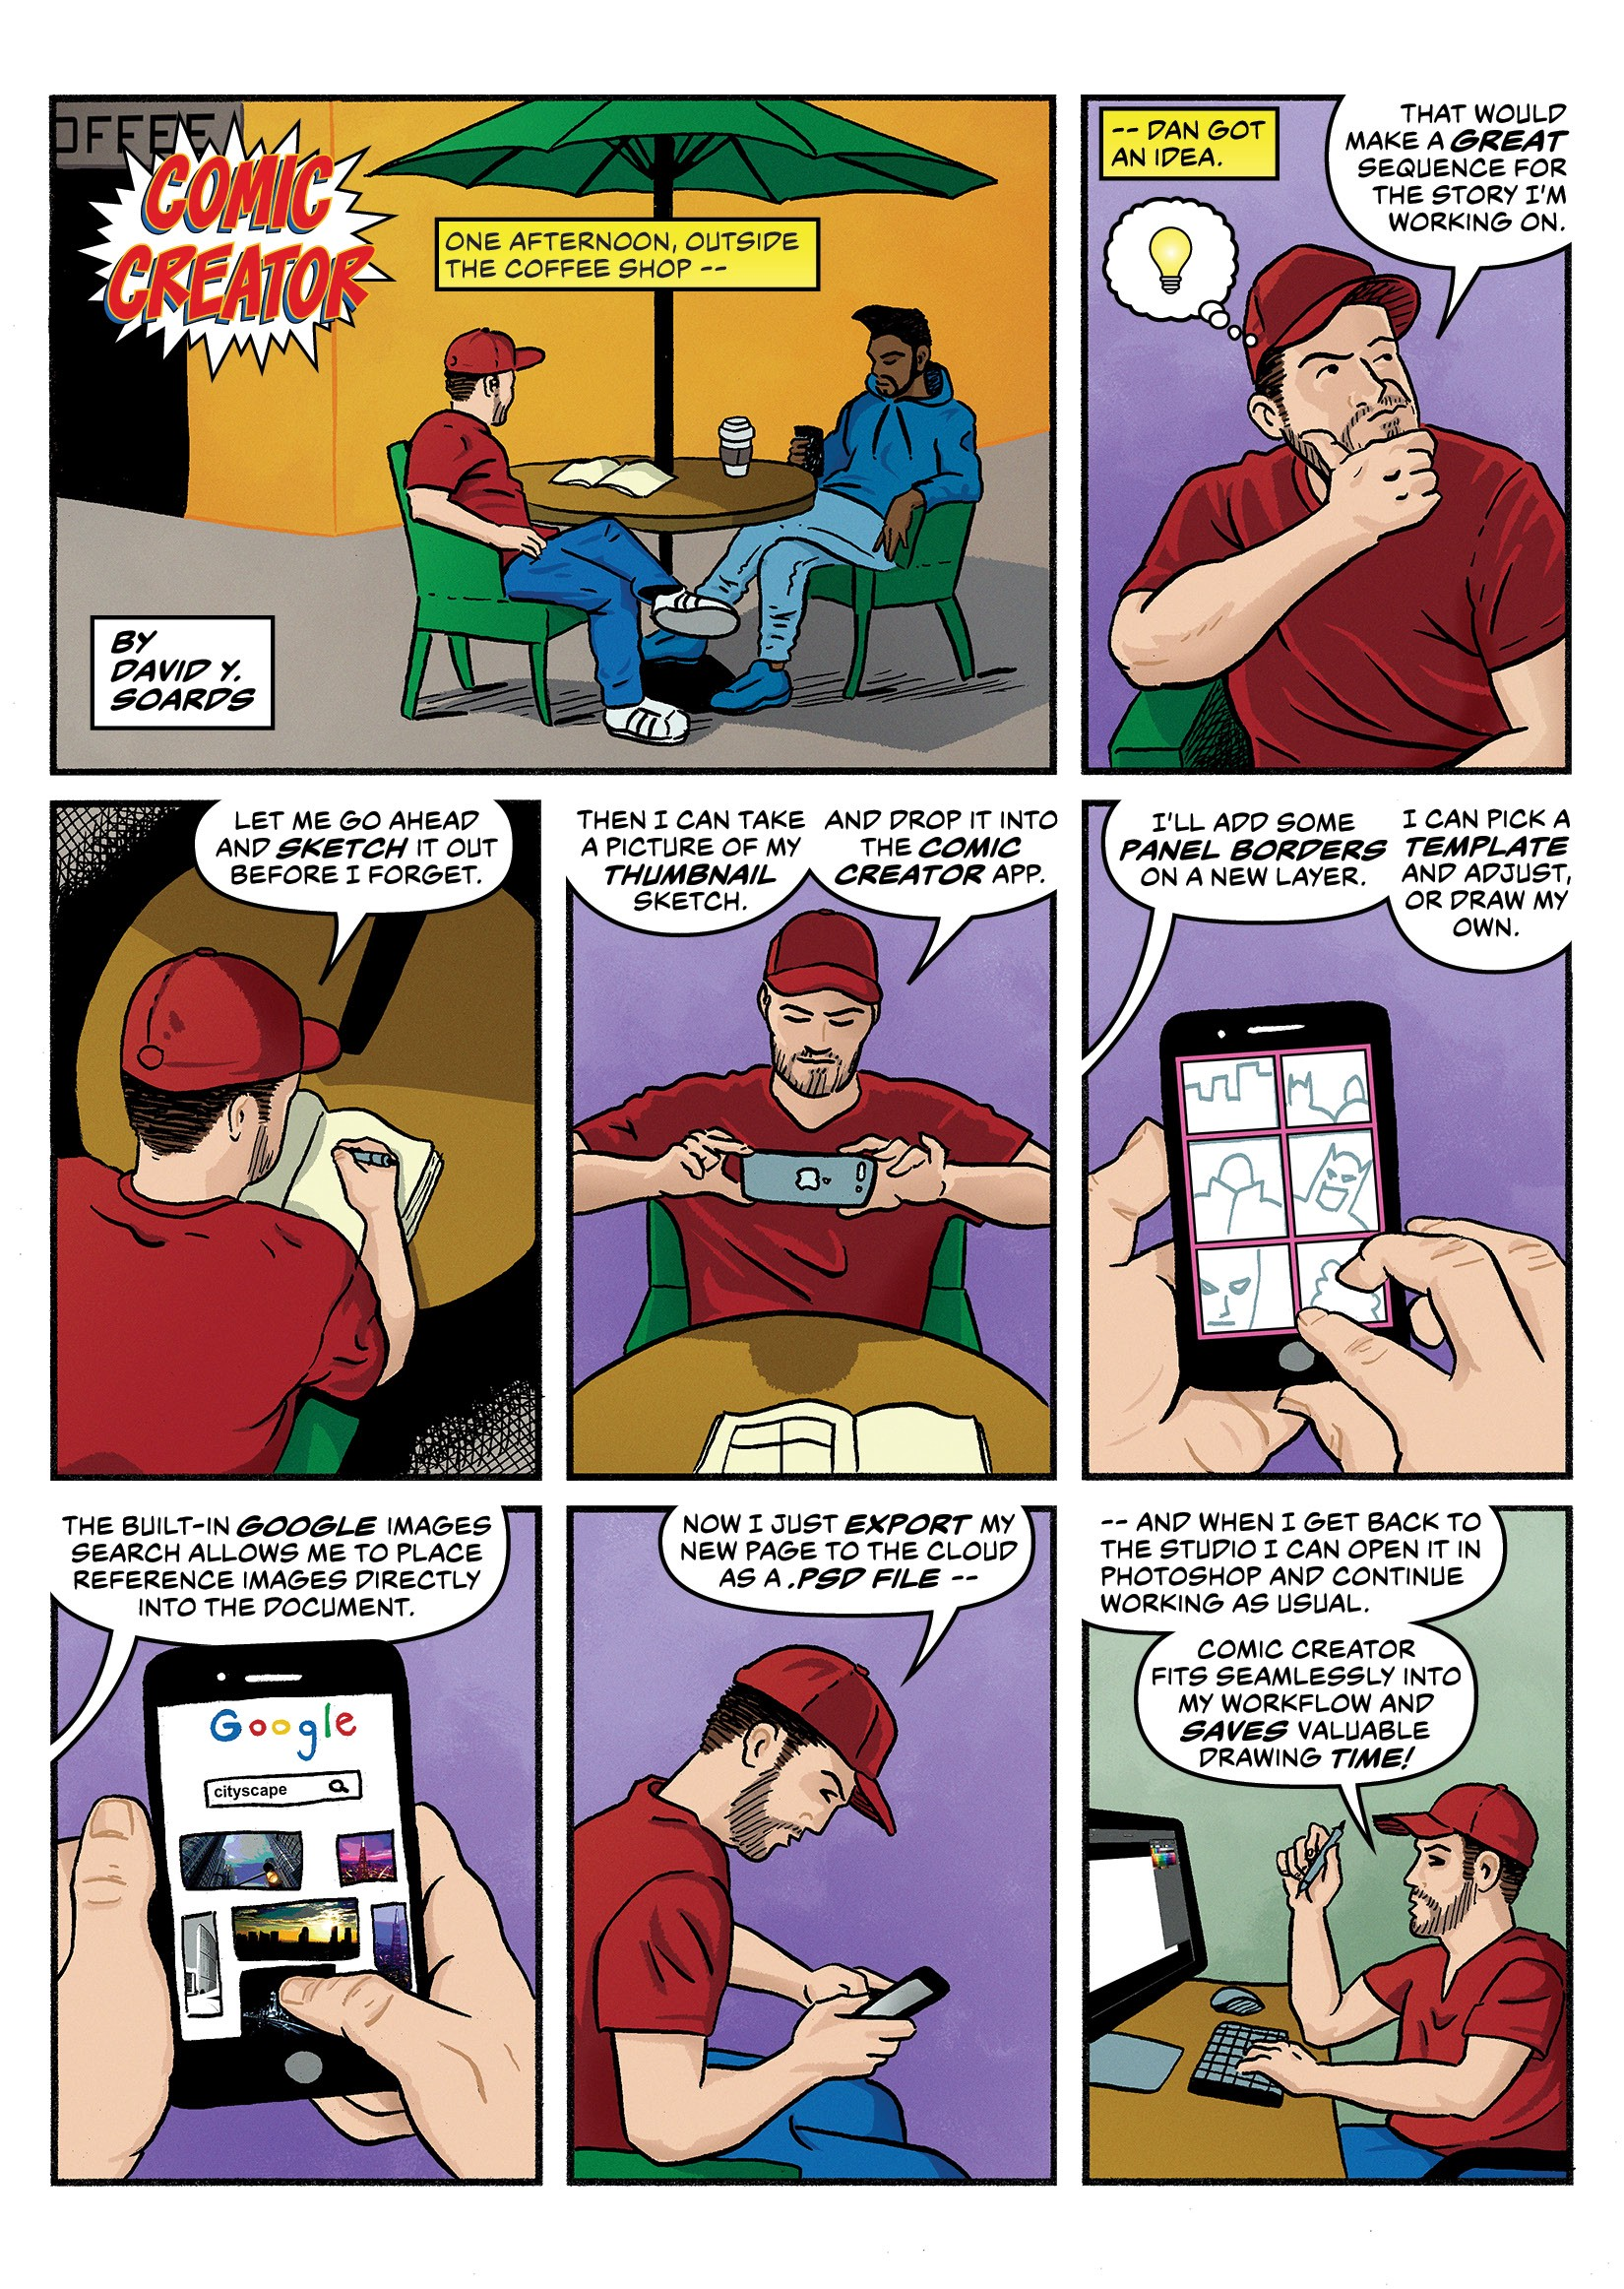 Designing The Comic Creator Mobile App